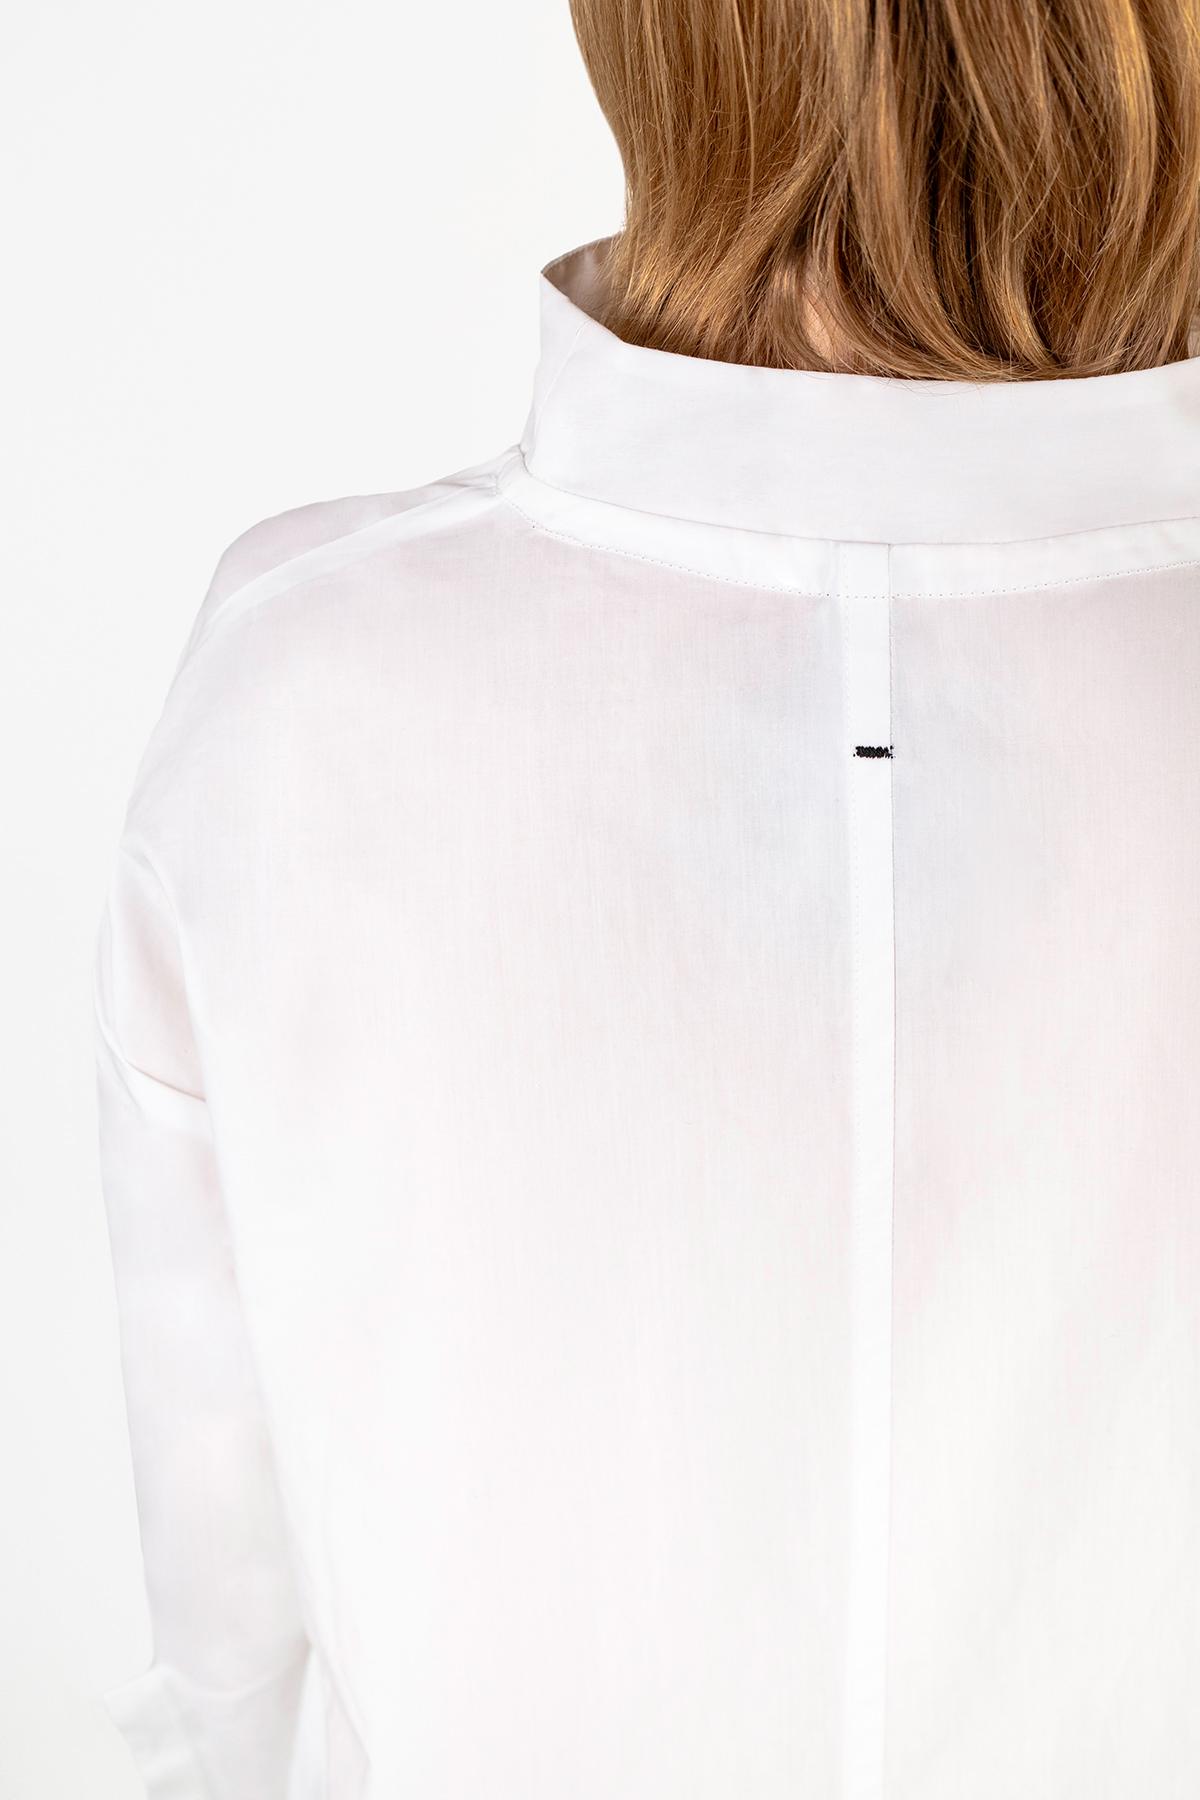 White Shirt 7378